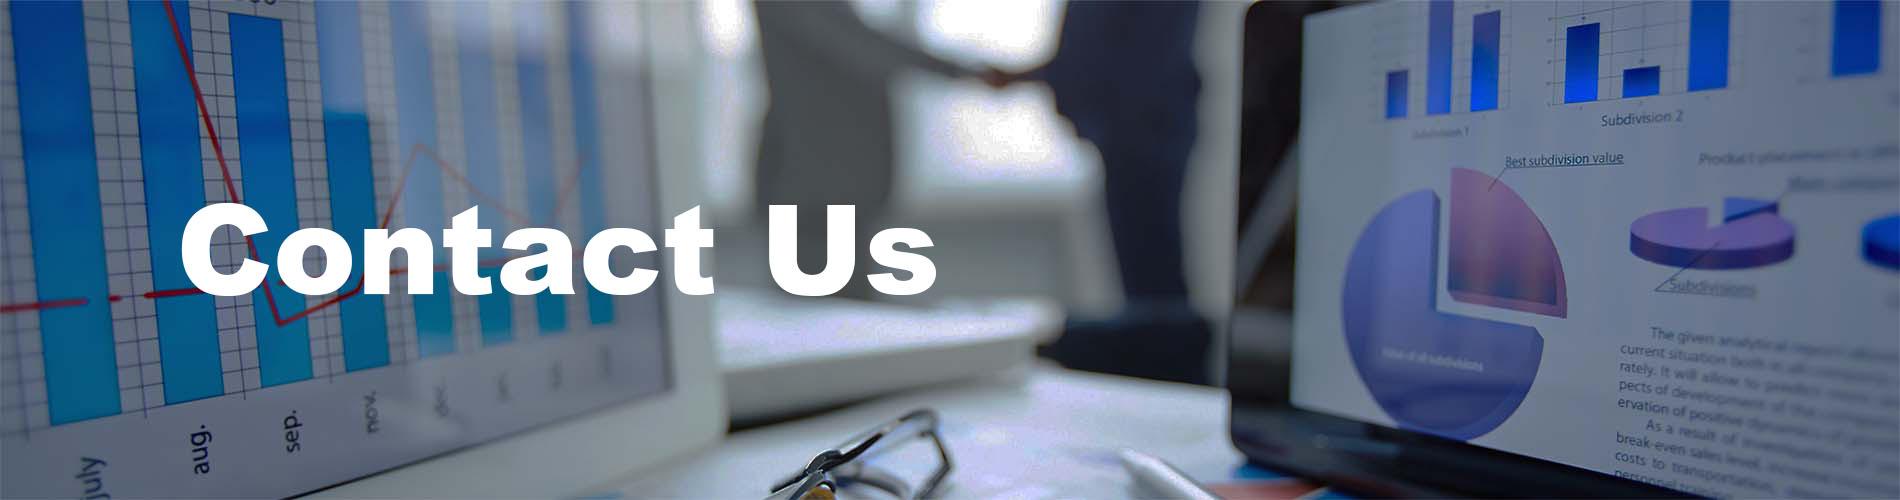 Conact Us Laser Web Maker